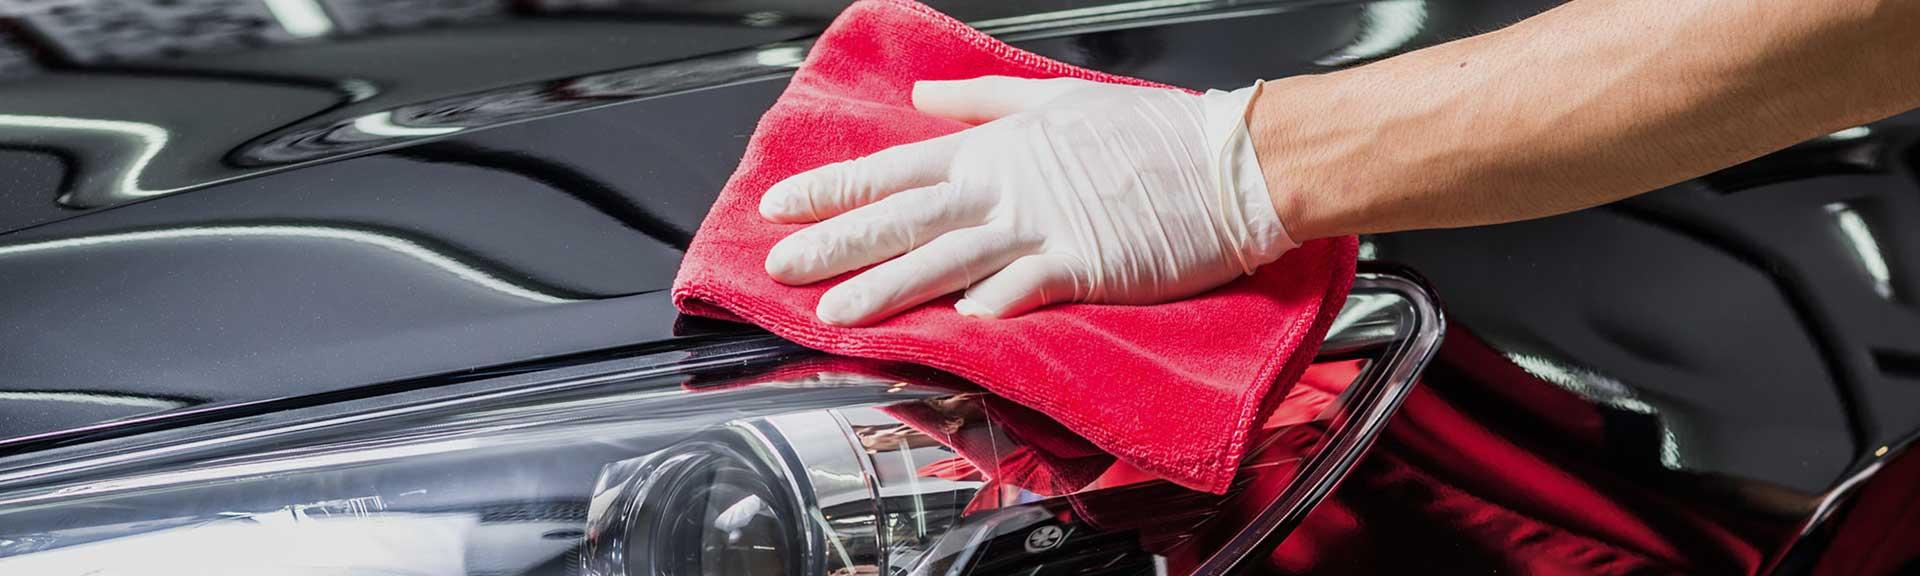 DoctorWash, πλυντήριο, φροντίδα αυτοκινήτου, car care